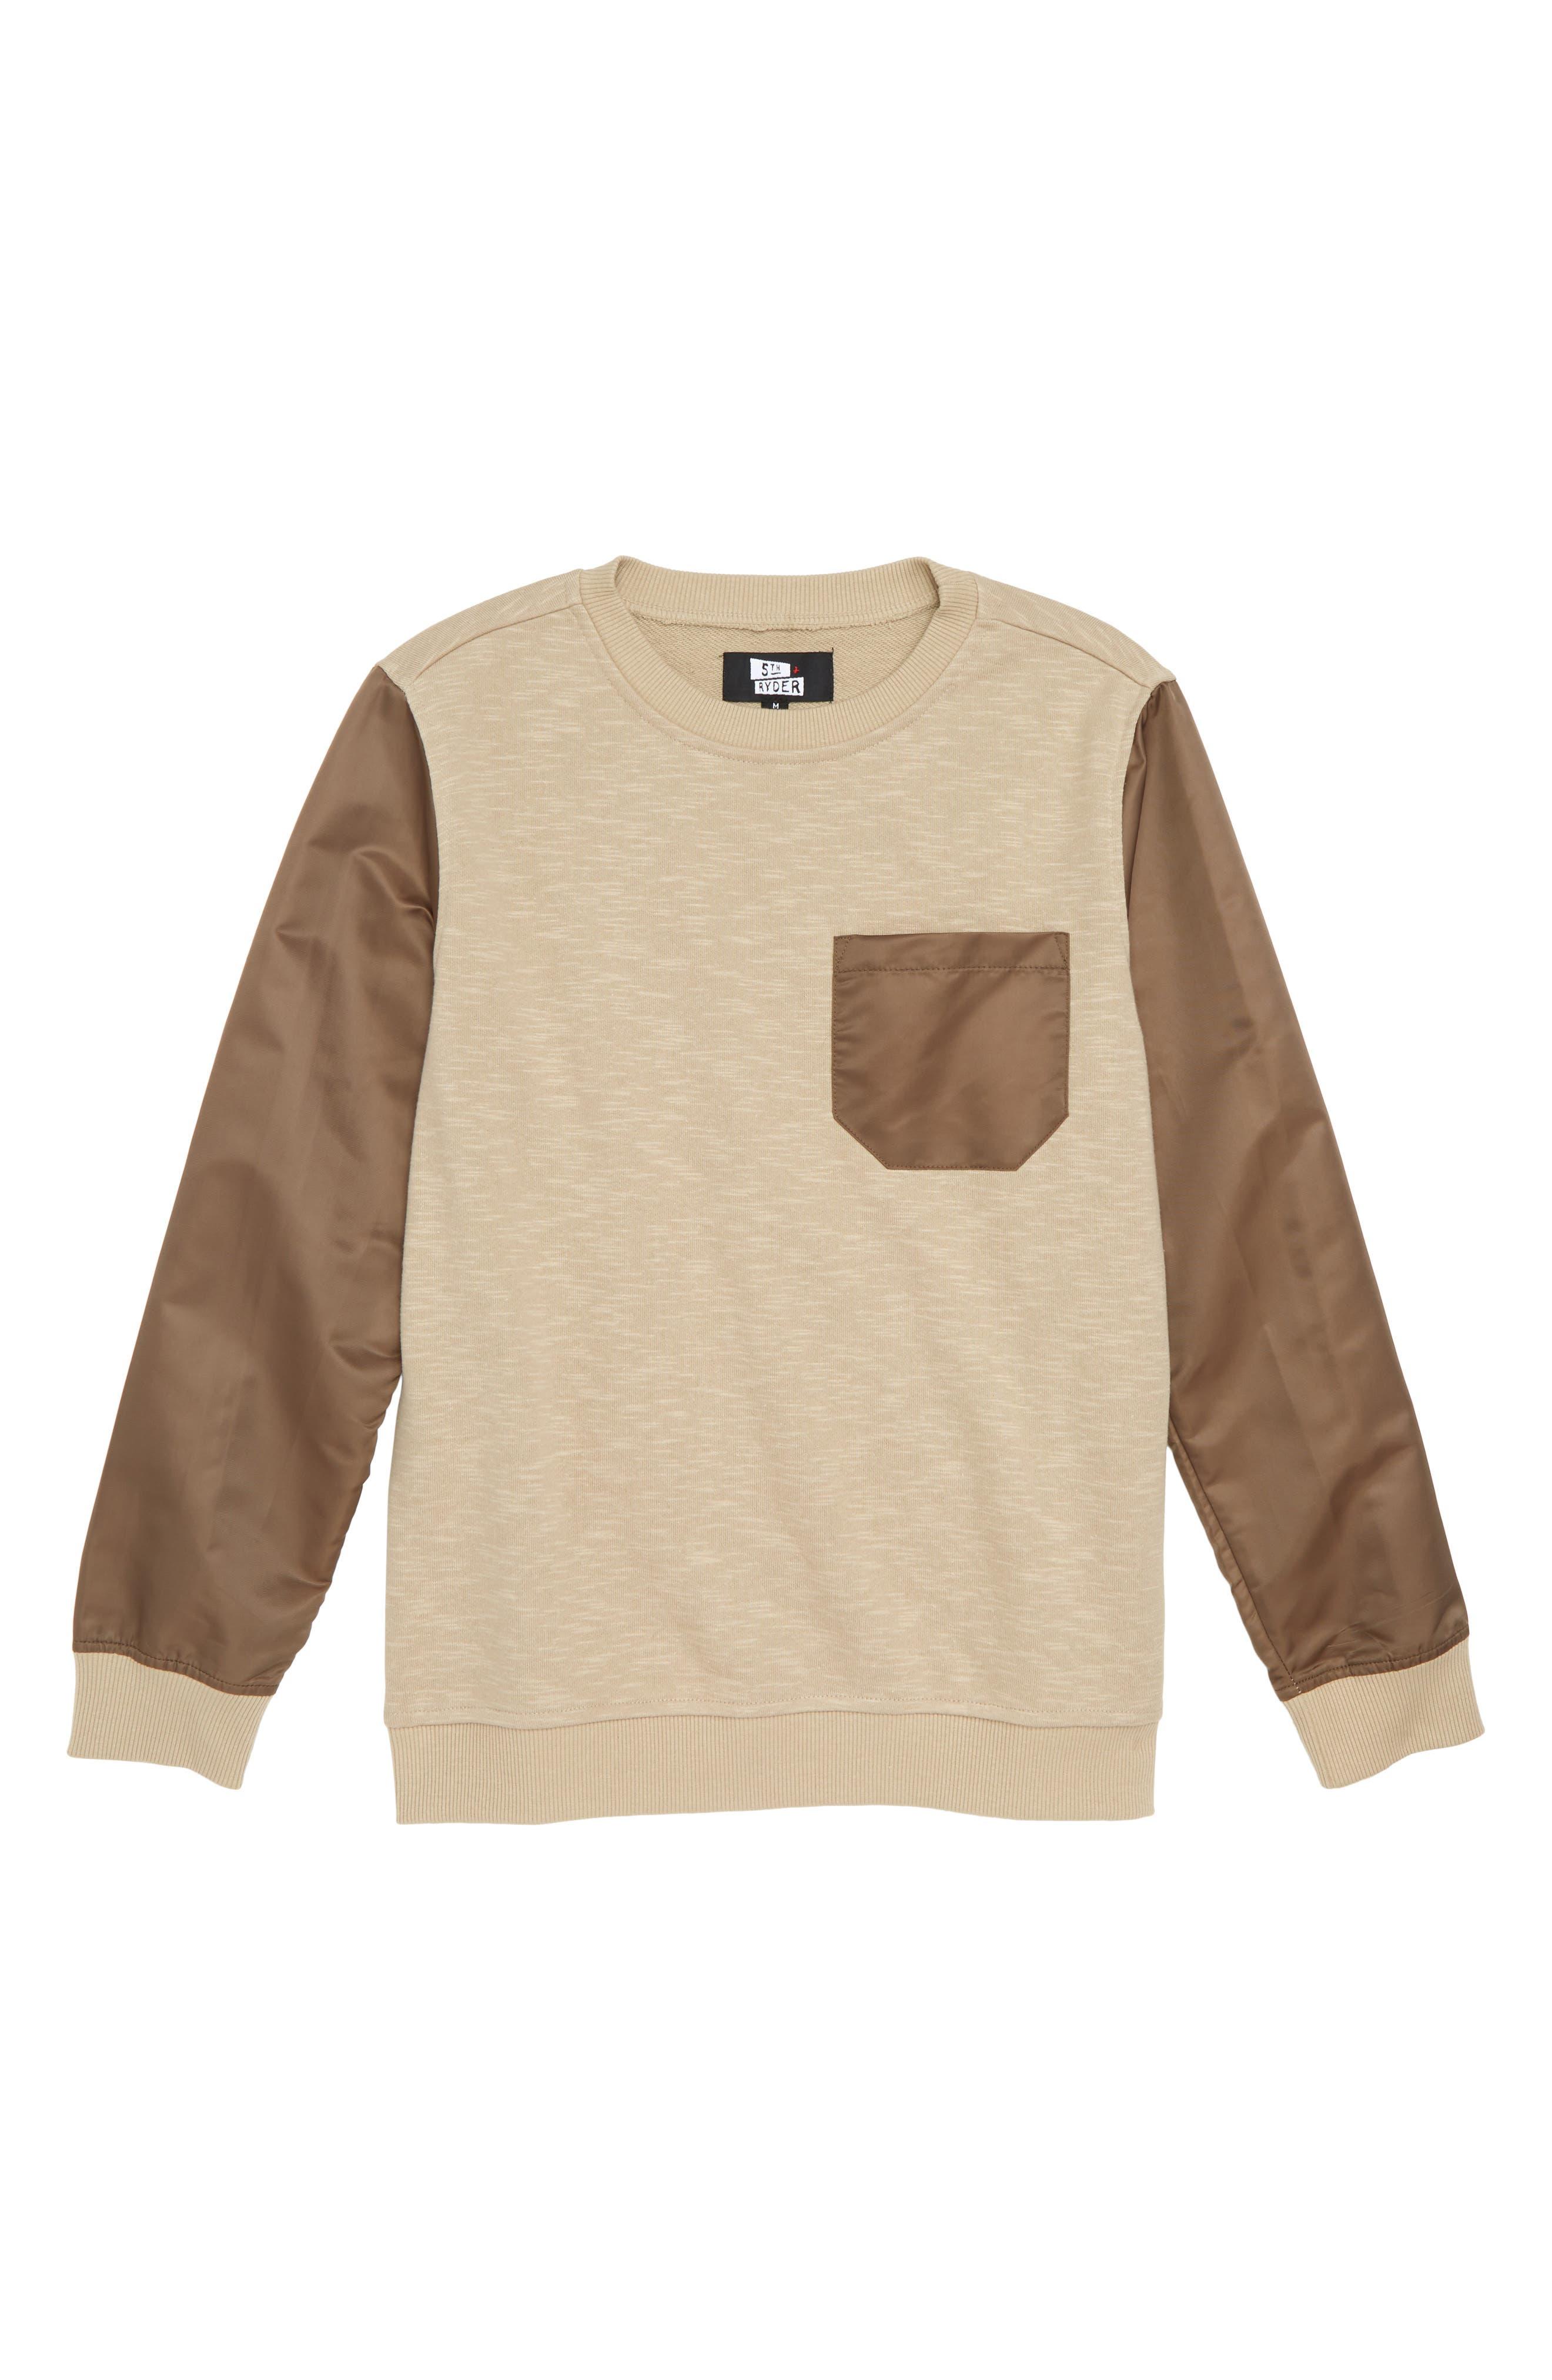 Elwood Pocket Sweatshirt,                             Main thumbnail 1, color,                             250